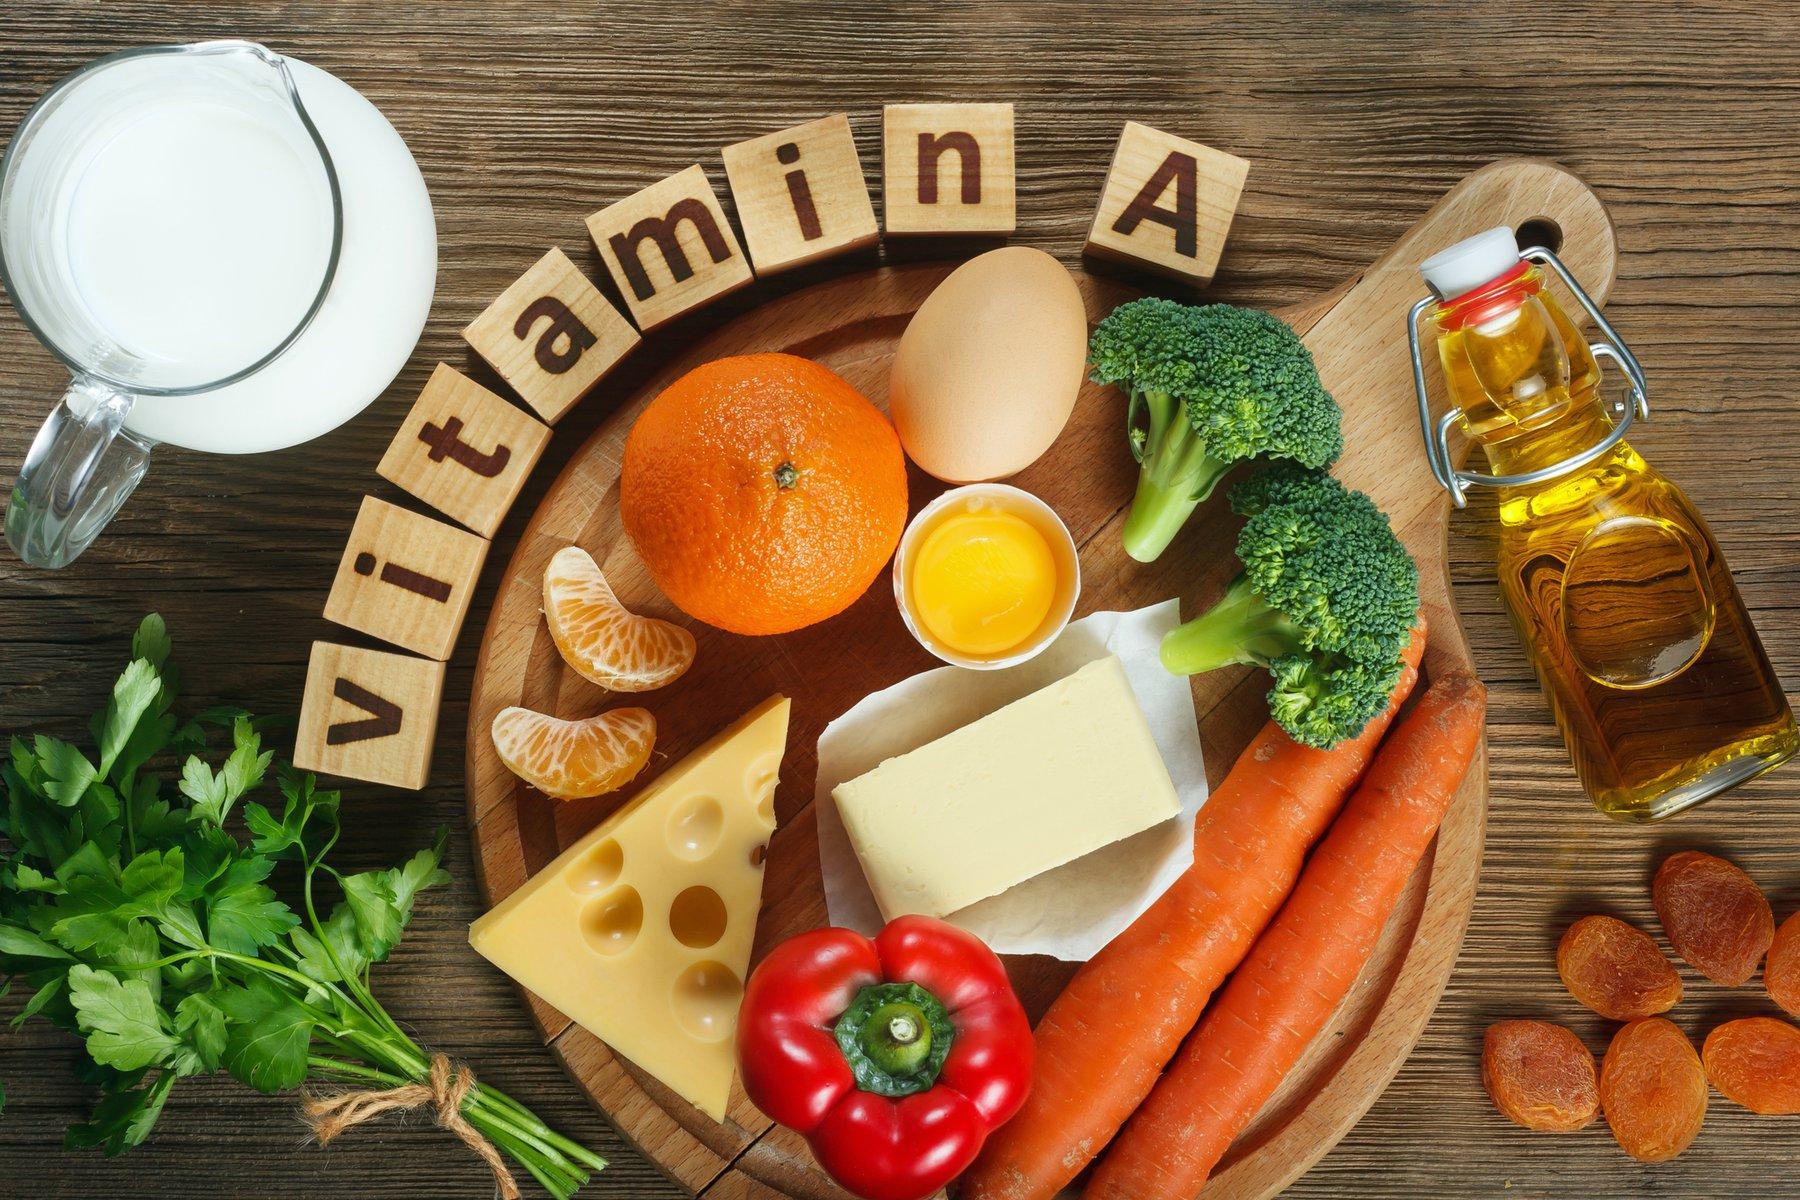 20190419_041453_444449_vitamin-a.max-1800x1800.jpg